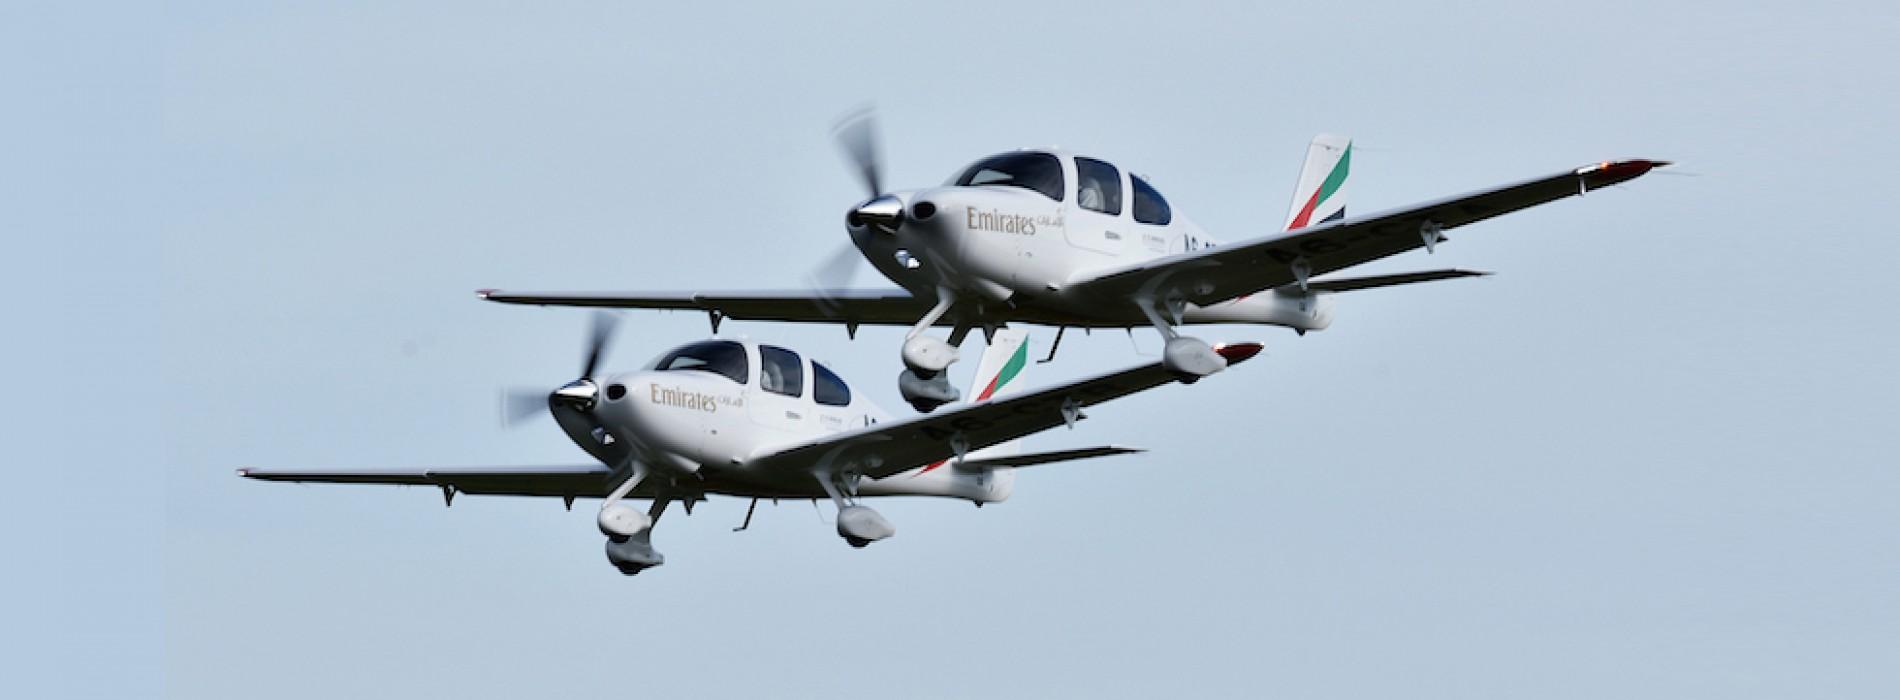 Emirates Flight Training Academy officially